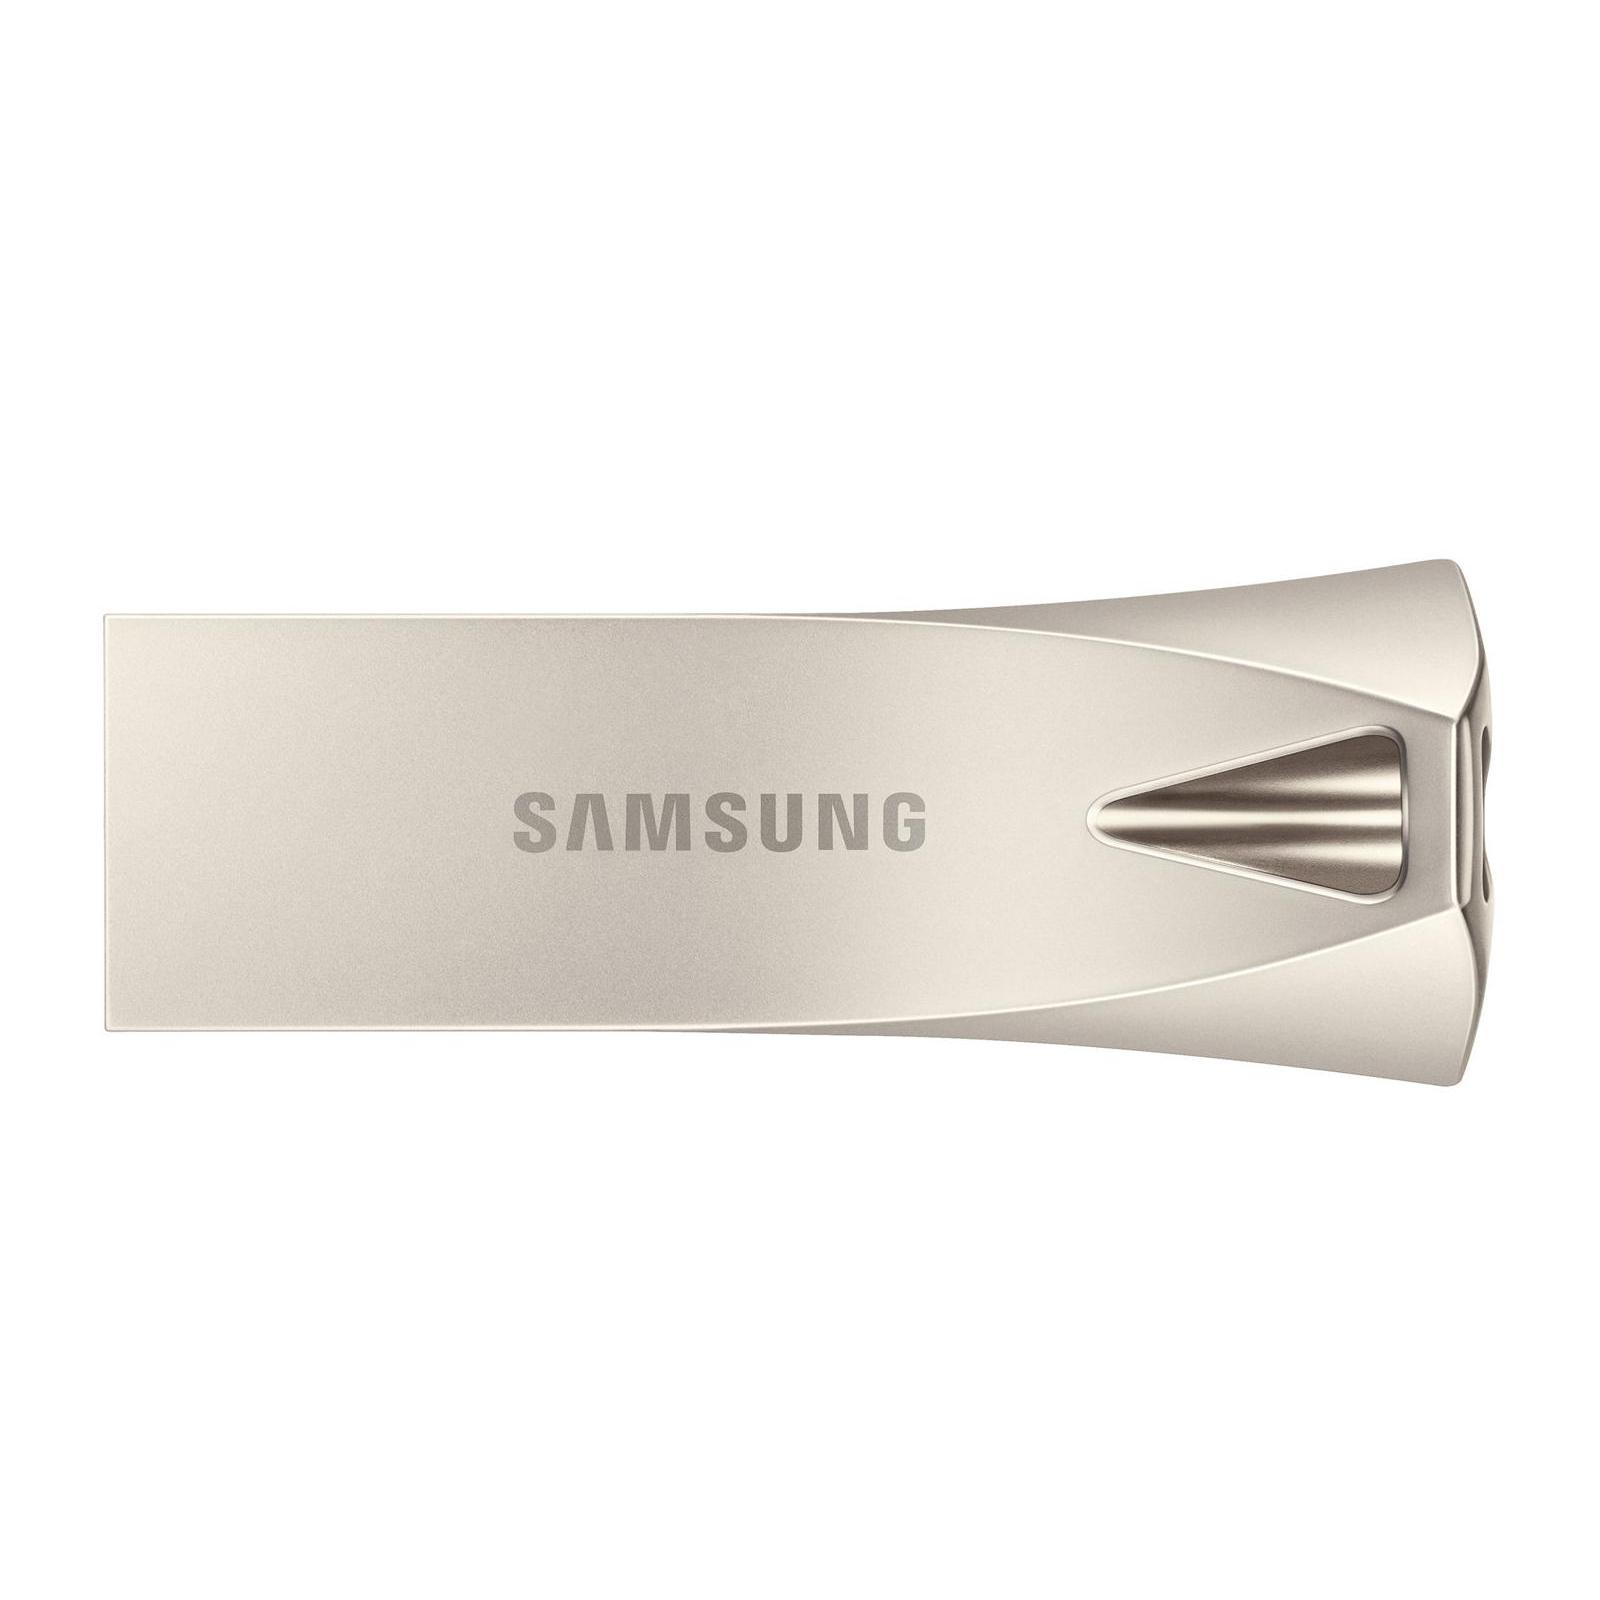 USB флеш накопитель Samsung 64GB Bar Plus Silver USB 3.1 (MUF-64BE3/APC)